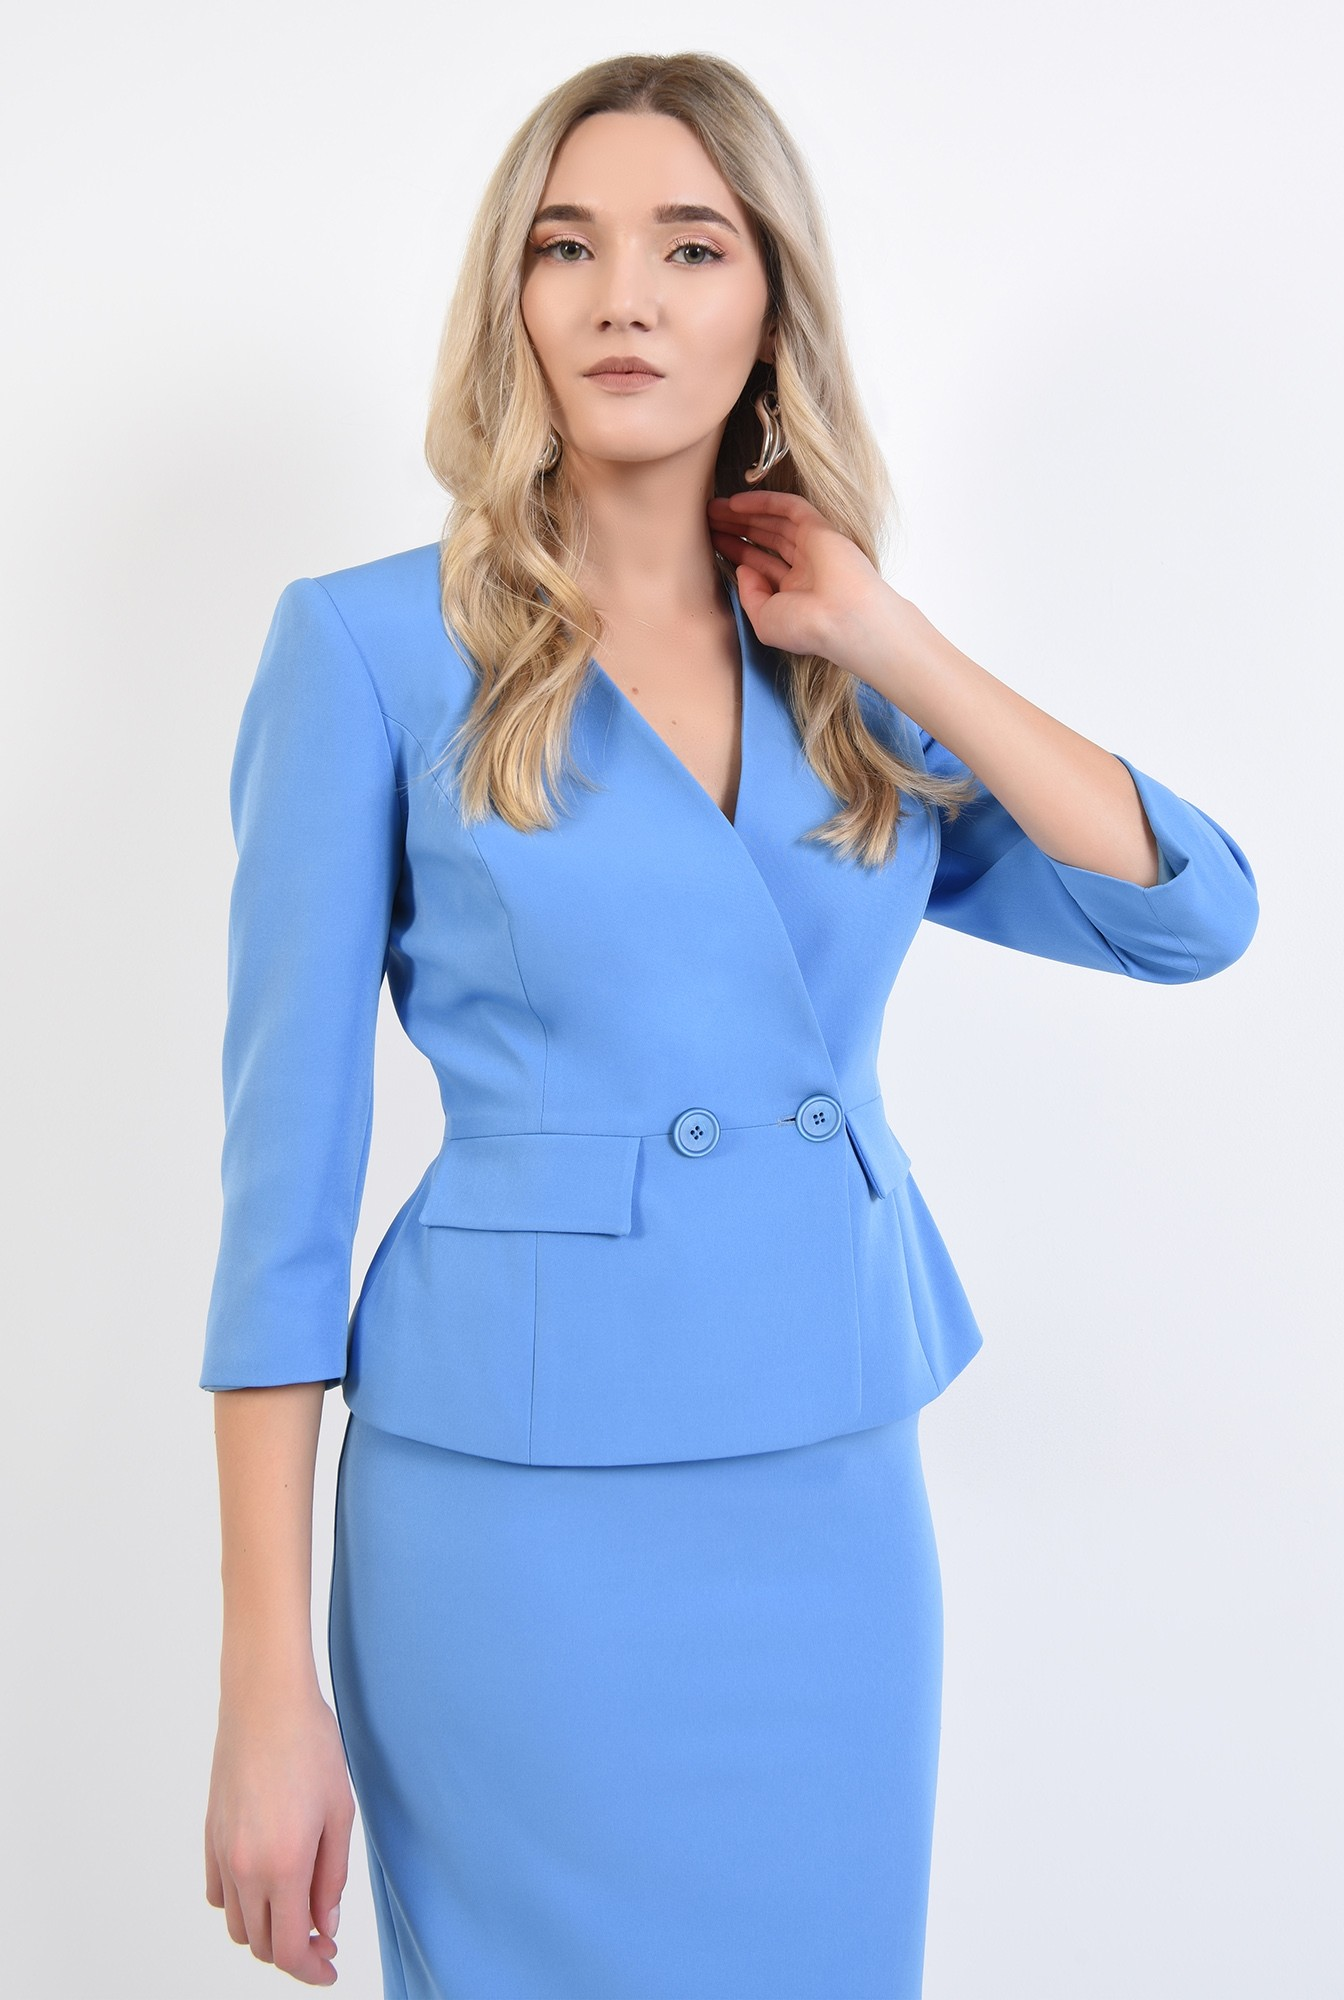 0 - 360 - sacou bleu, office, costum, buzunare cu clapa, anchior petrecut